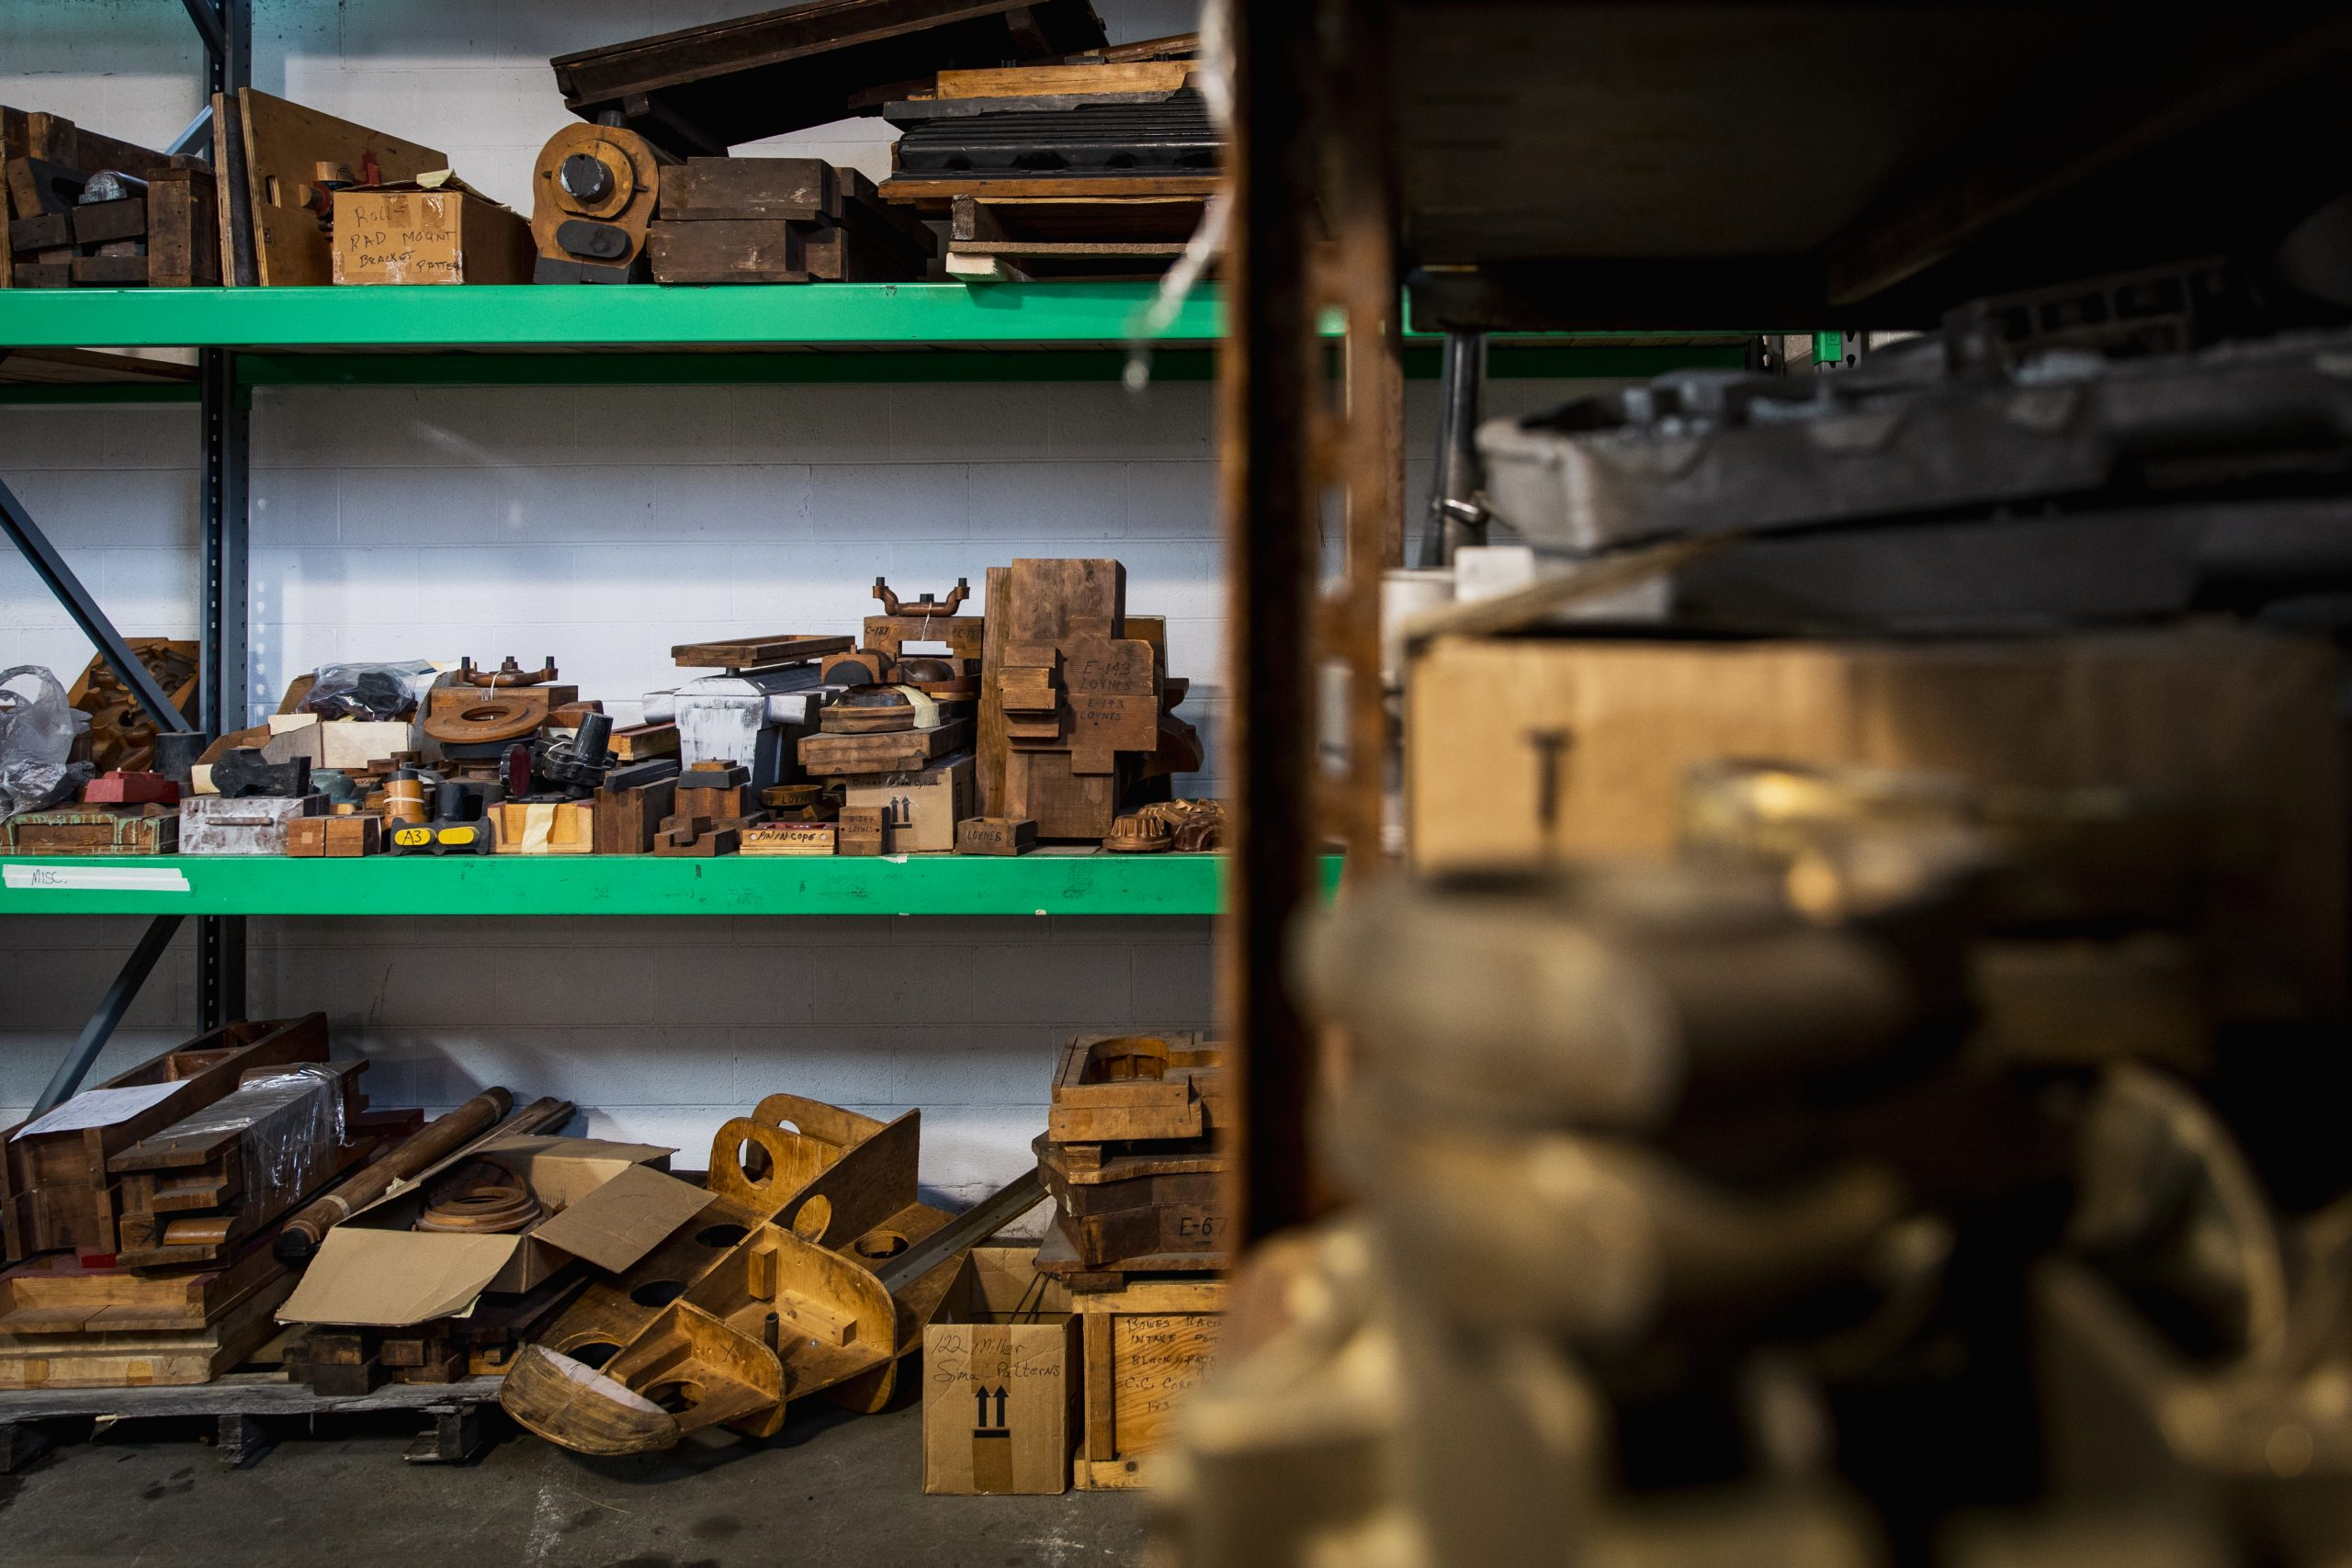 vintage racing parts on shelves